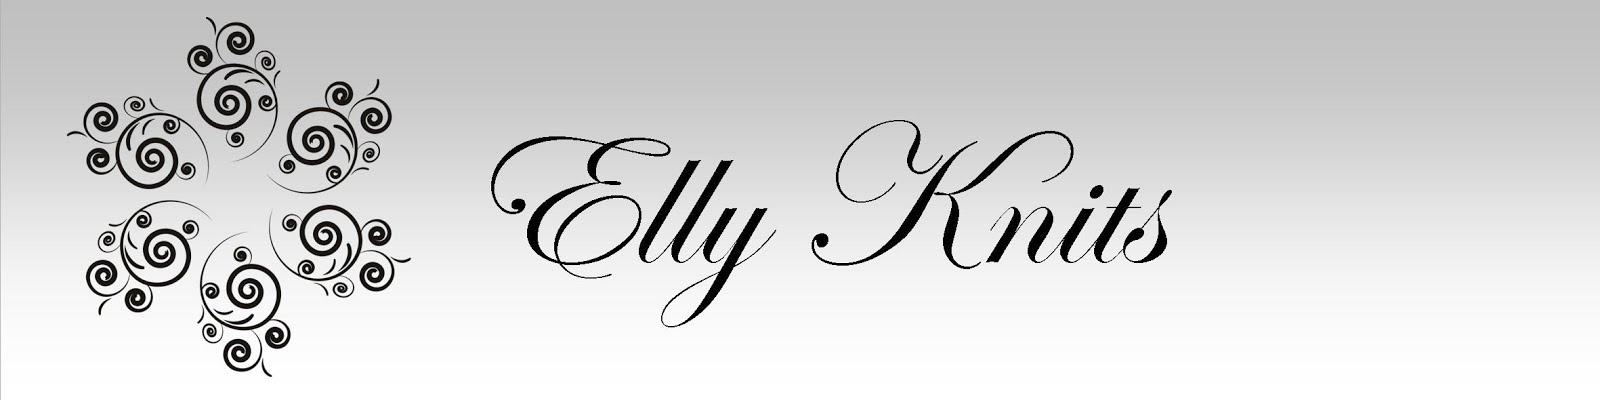 Elly Knits